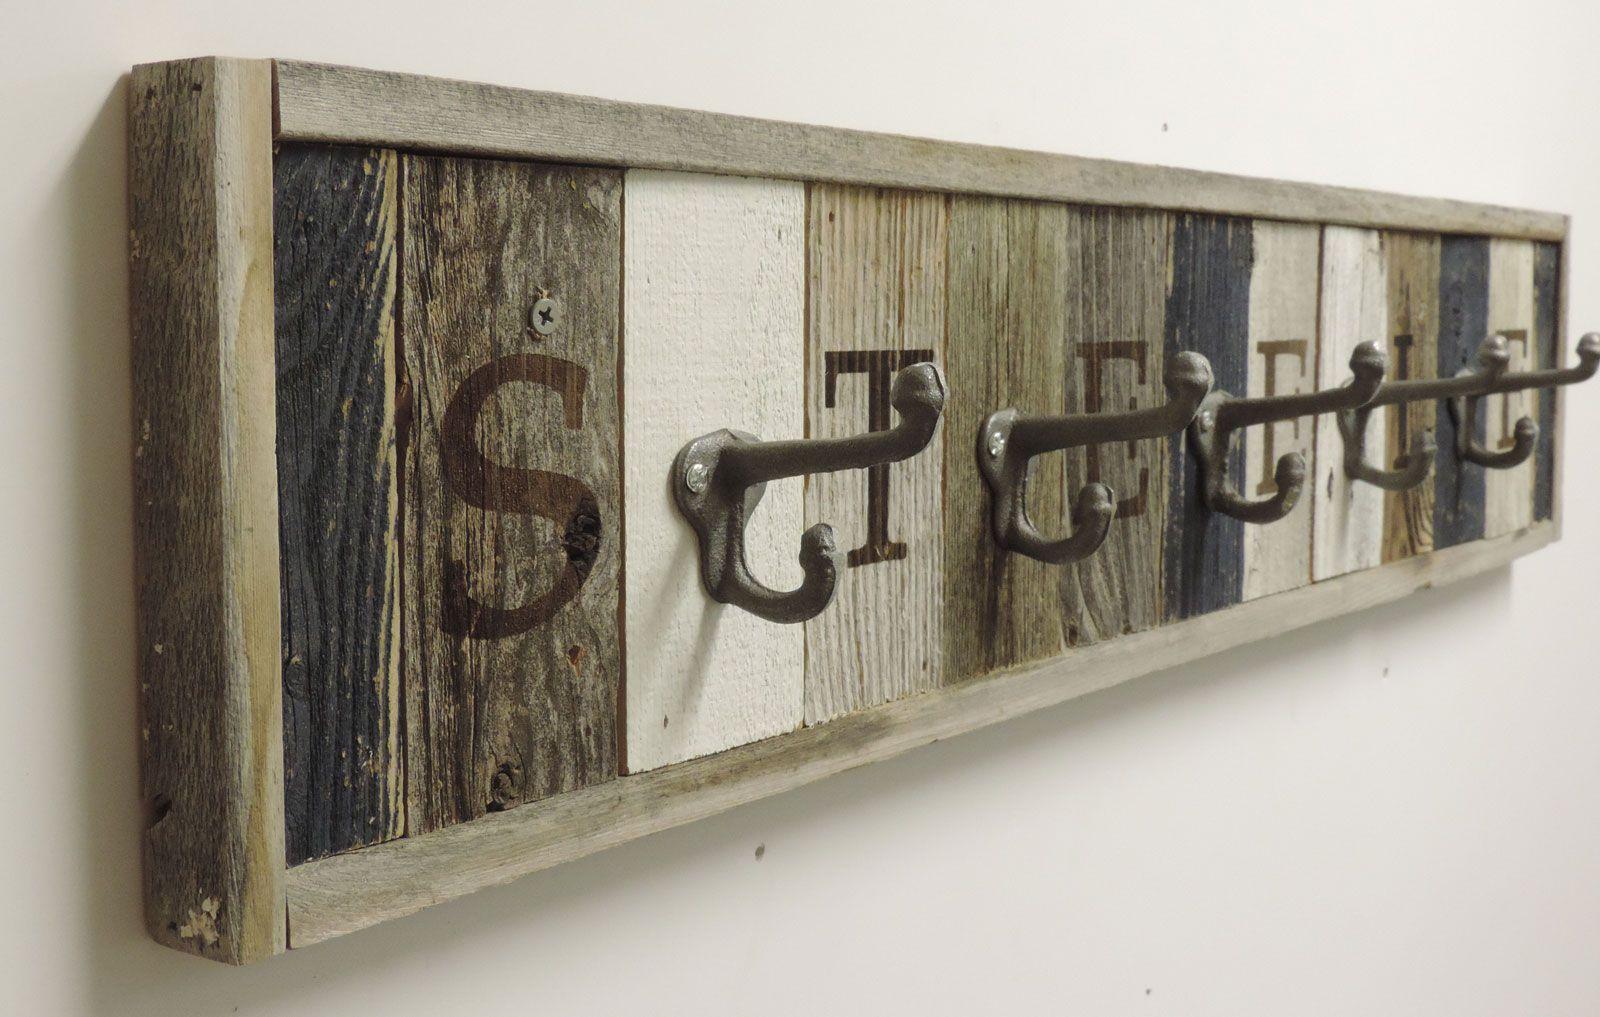 Personalized Reclaimed Wooden Coat Rack Barn Wood Hooks Proyectos De Madera De Granero Recortes De Madera Madera